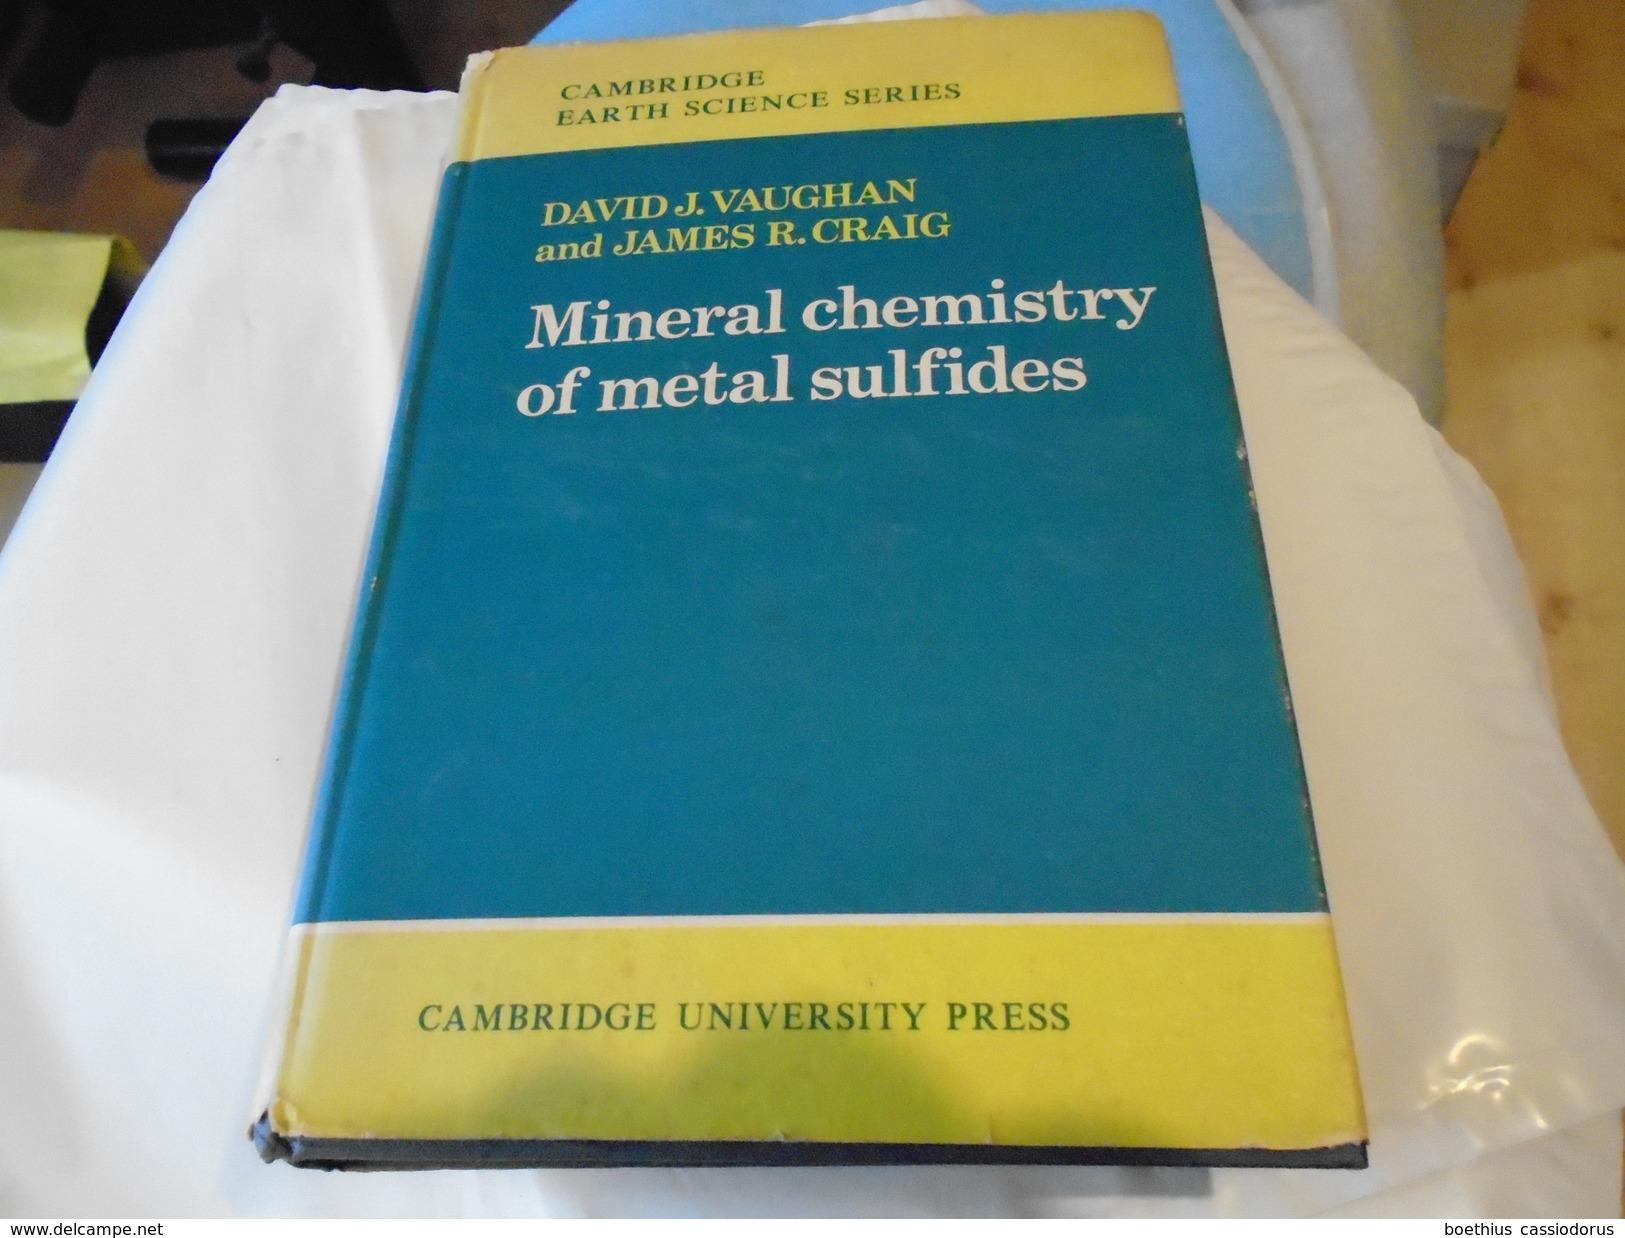 MINERAL CHEMISTRY OF METAL SULFIDES 1978 DAVID J. VAUGHAN JAMES R. CRAIG / CAMBRIDGE EARTH SCIENCE SERIES - Sciences